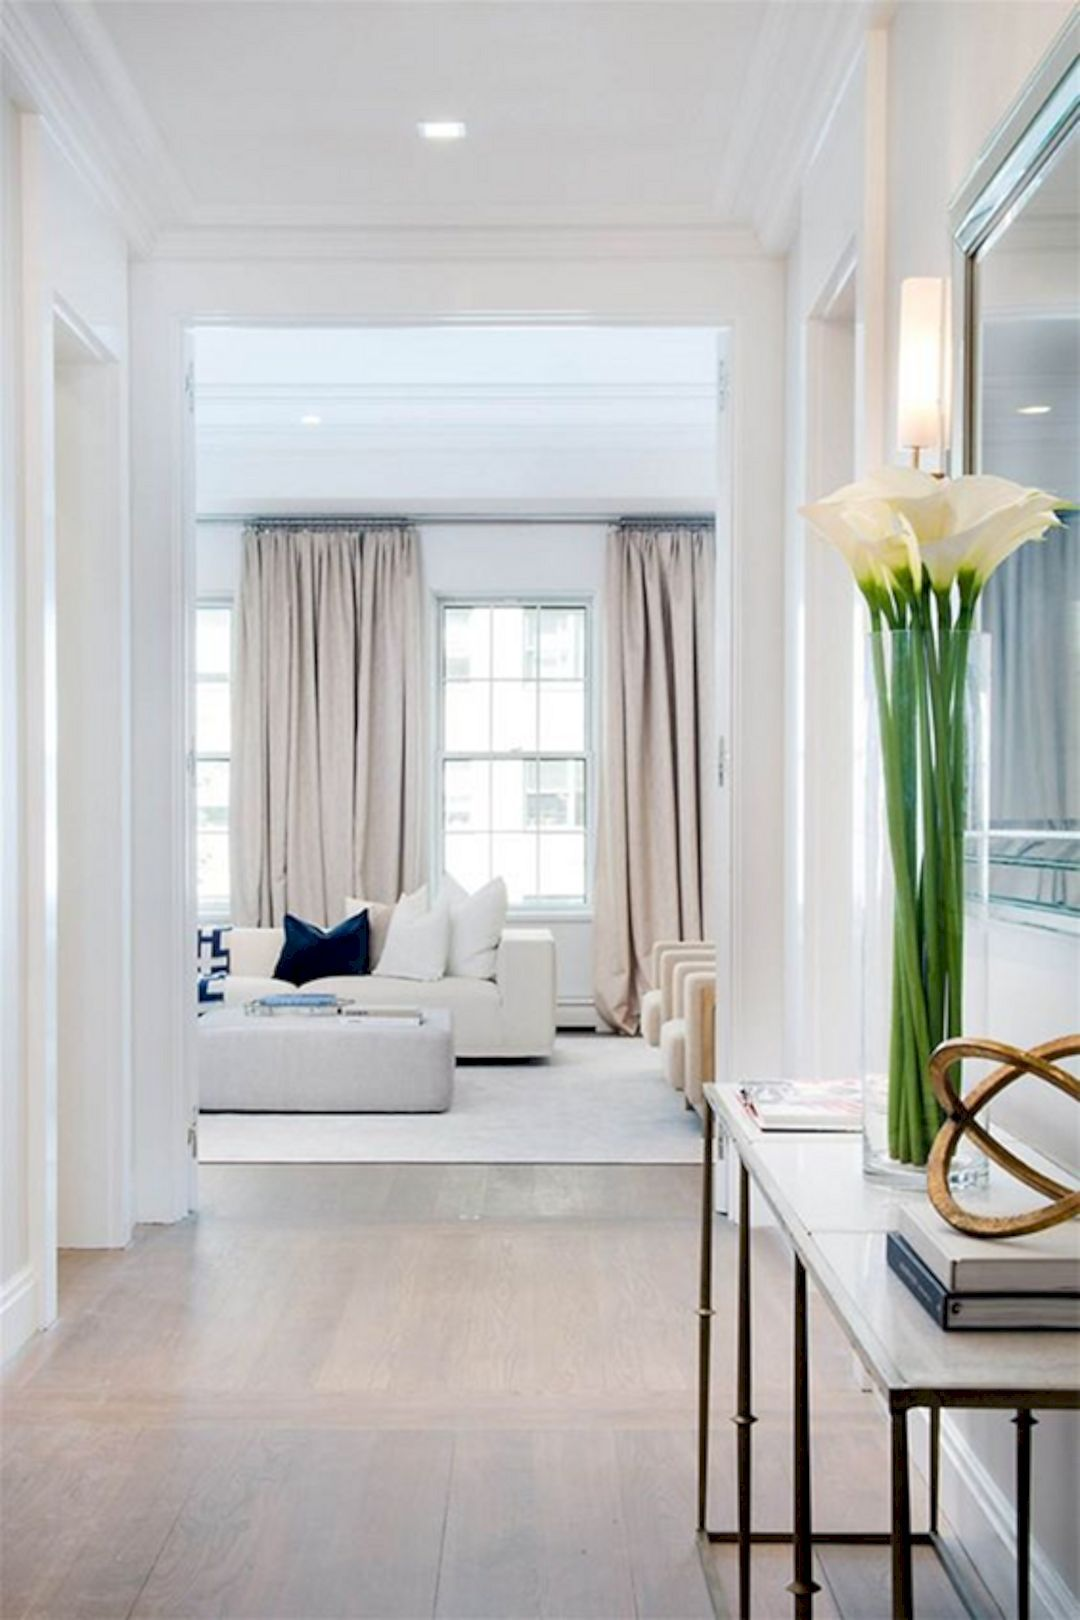 5 Awesome Modern Interior Design Ideas Modern Apartment Design House Interior Home